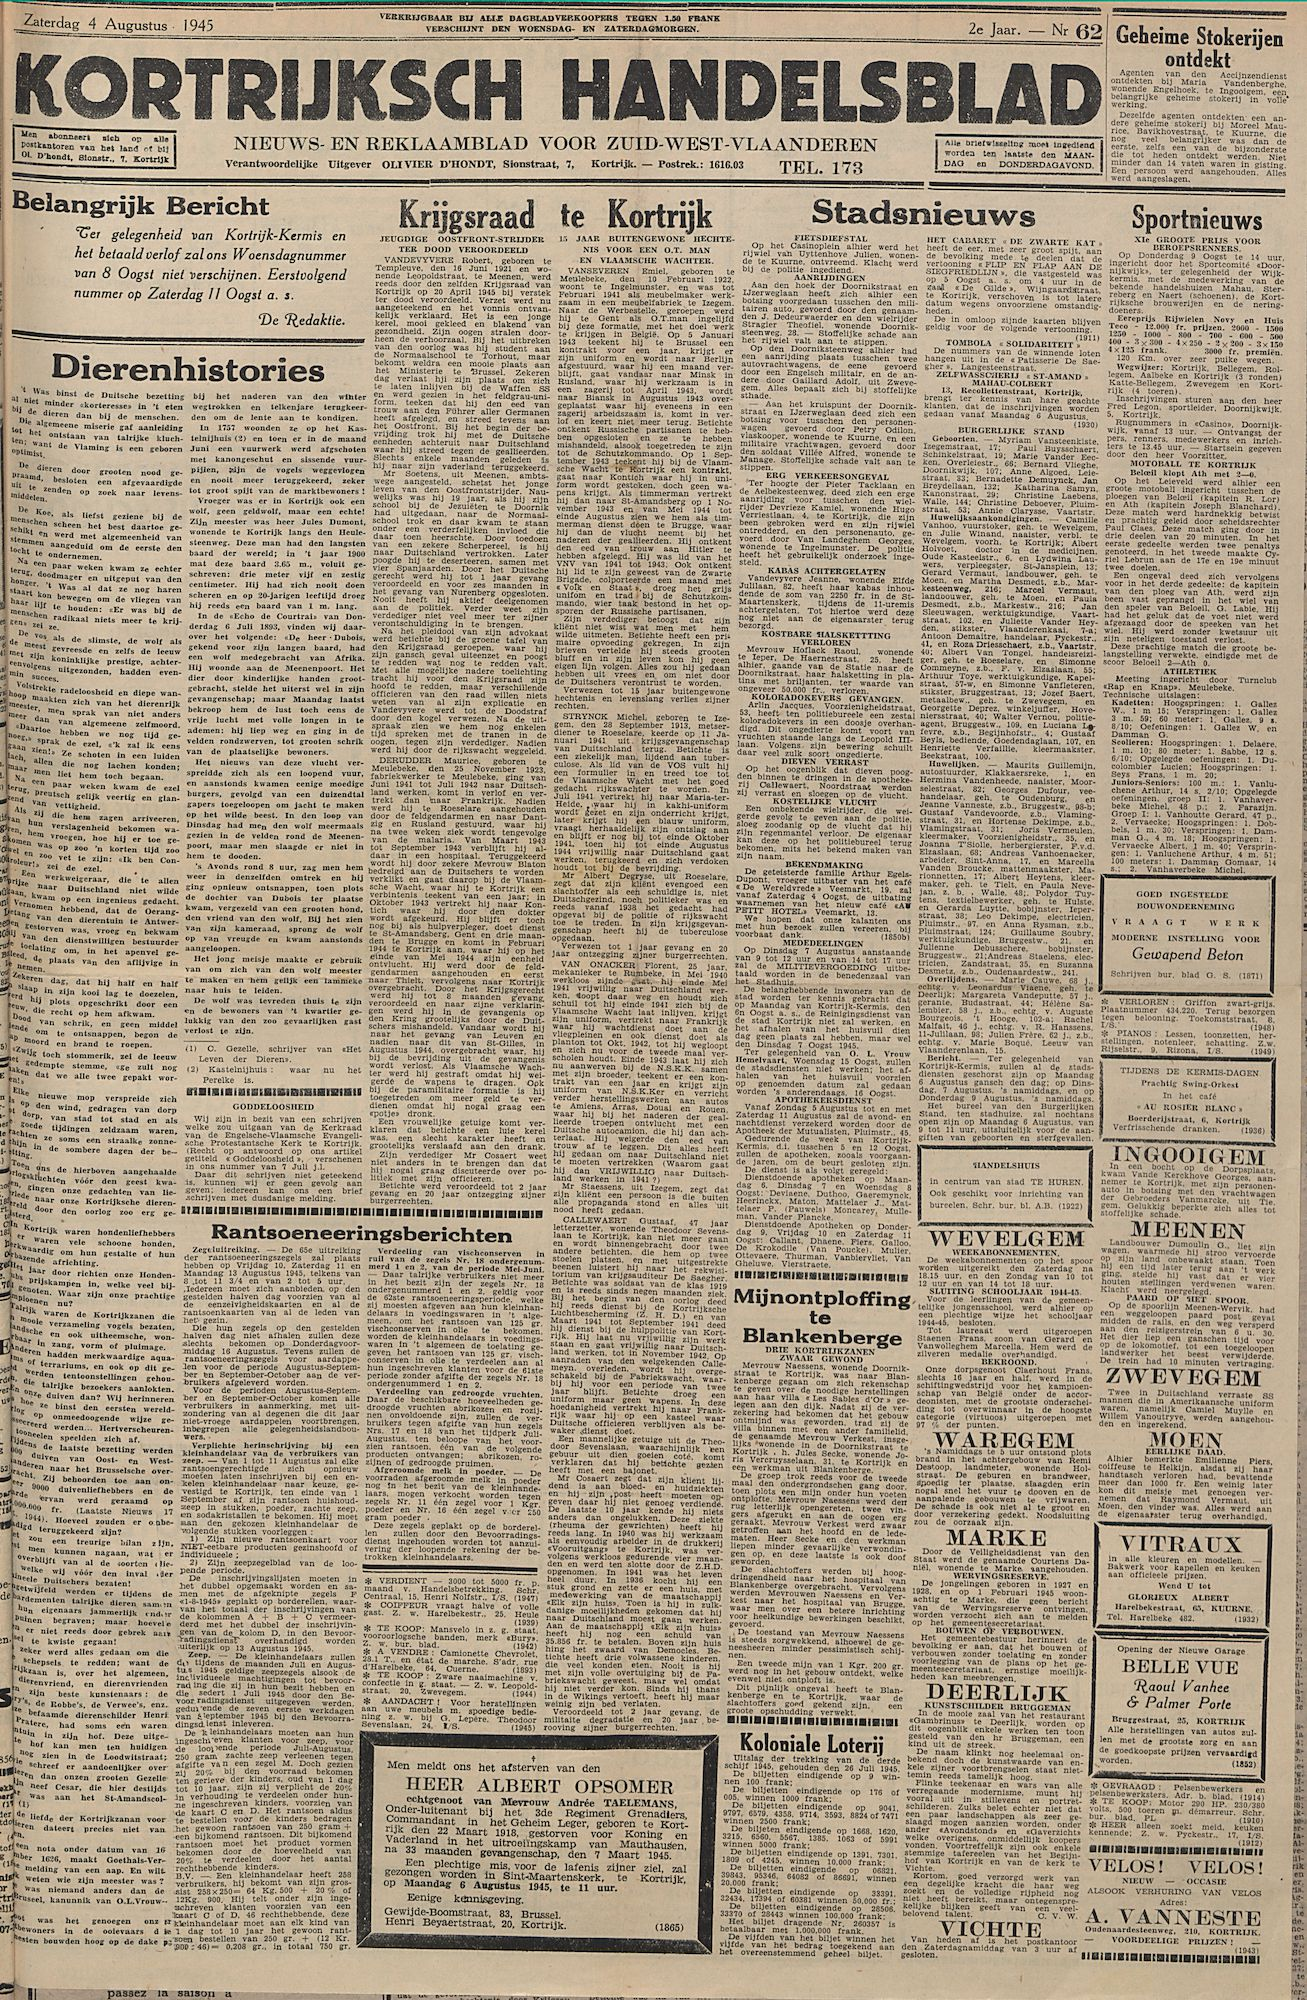 Kortrijksch Handelsblad 4 augustus 1945 Nr62 p1